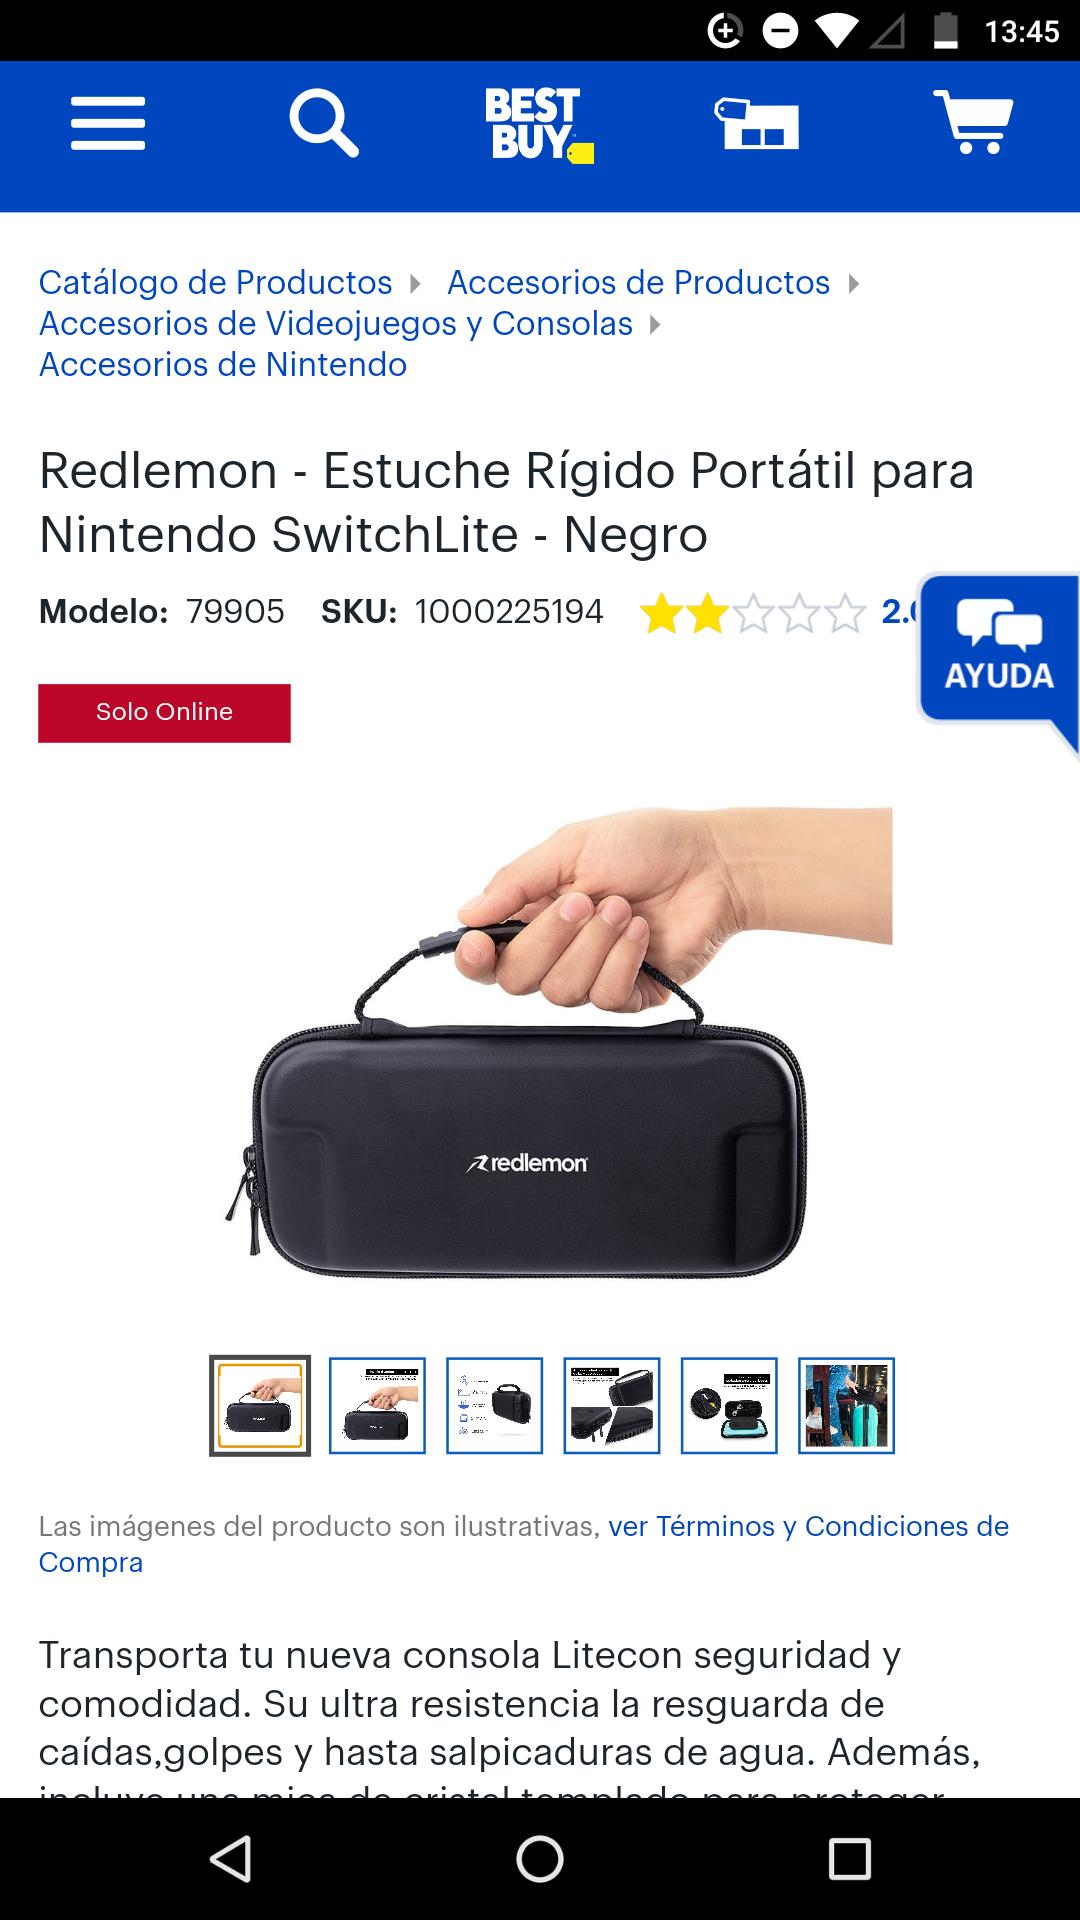 Best Buy: Redlemon - Estuche Rígido Portátil para Nintendo SwitchLite - Negro